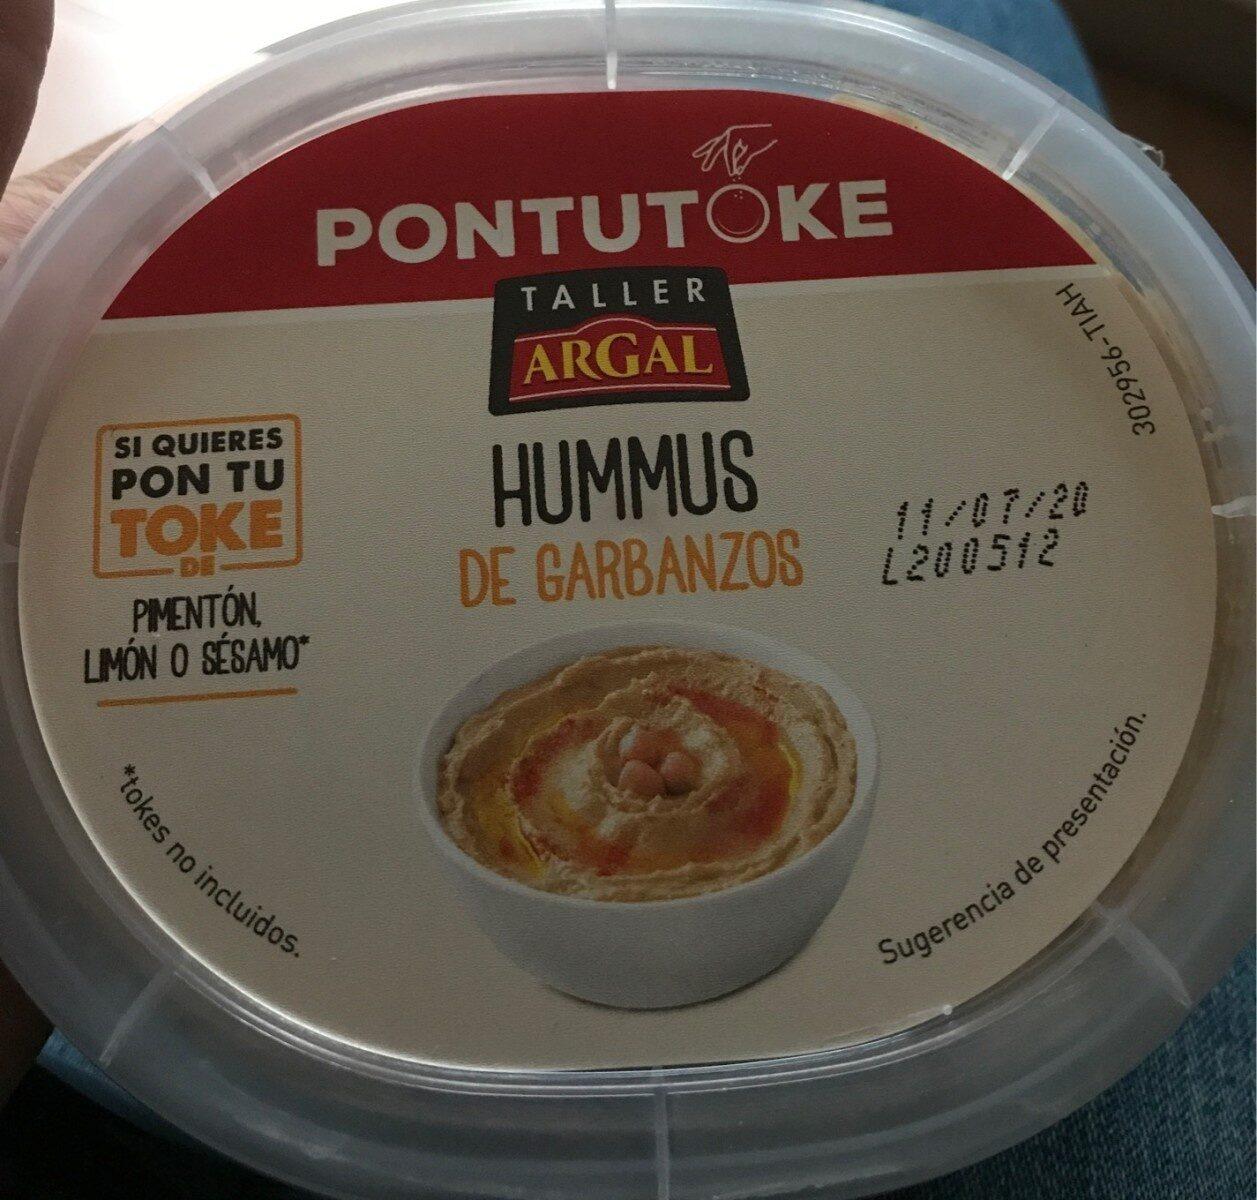 Hummus Pontutoke 220G - Producte - es